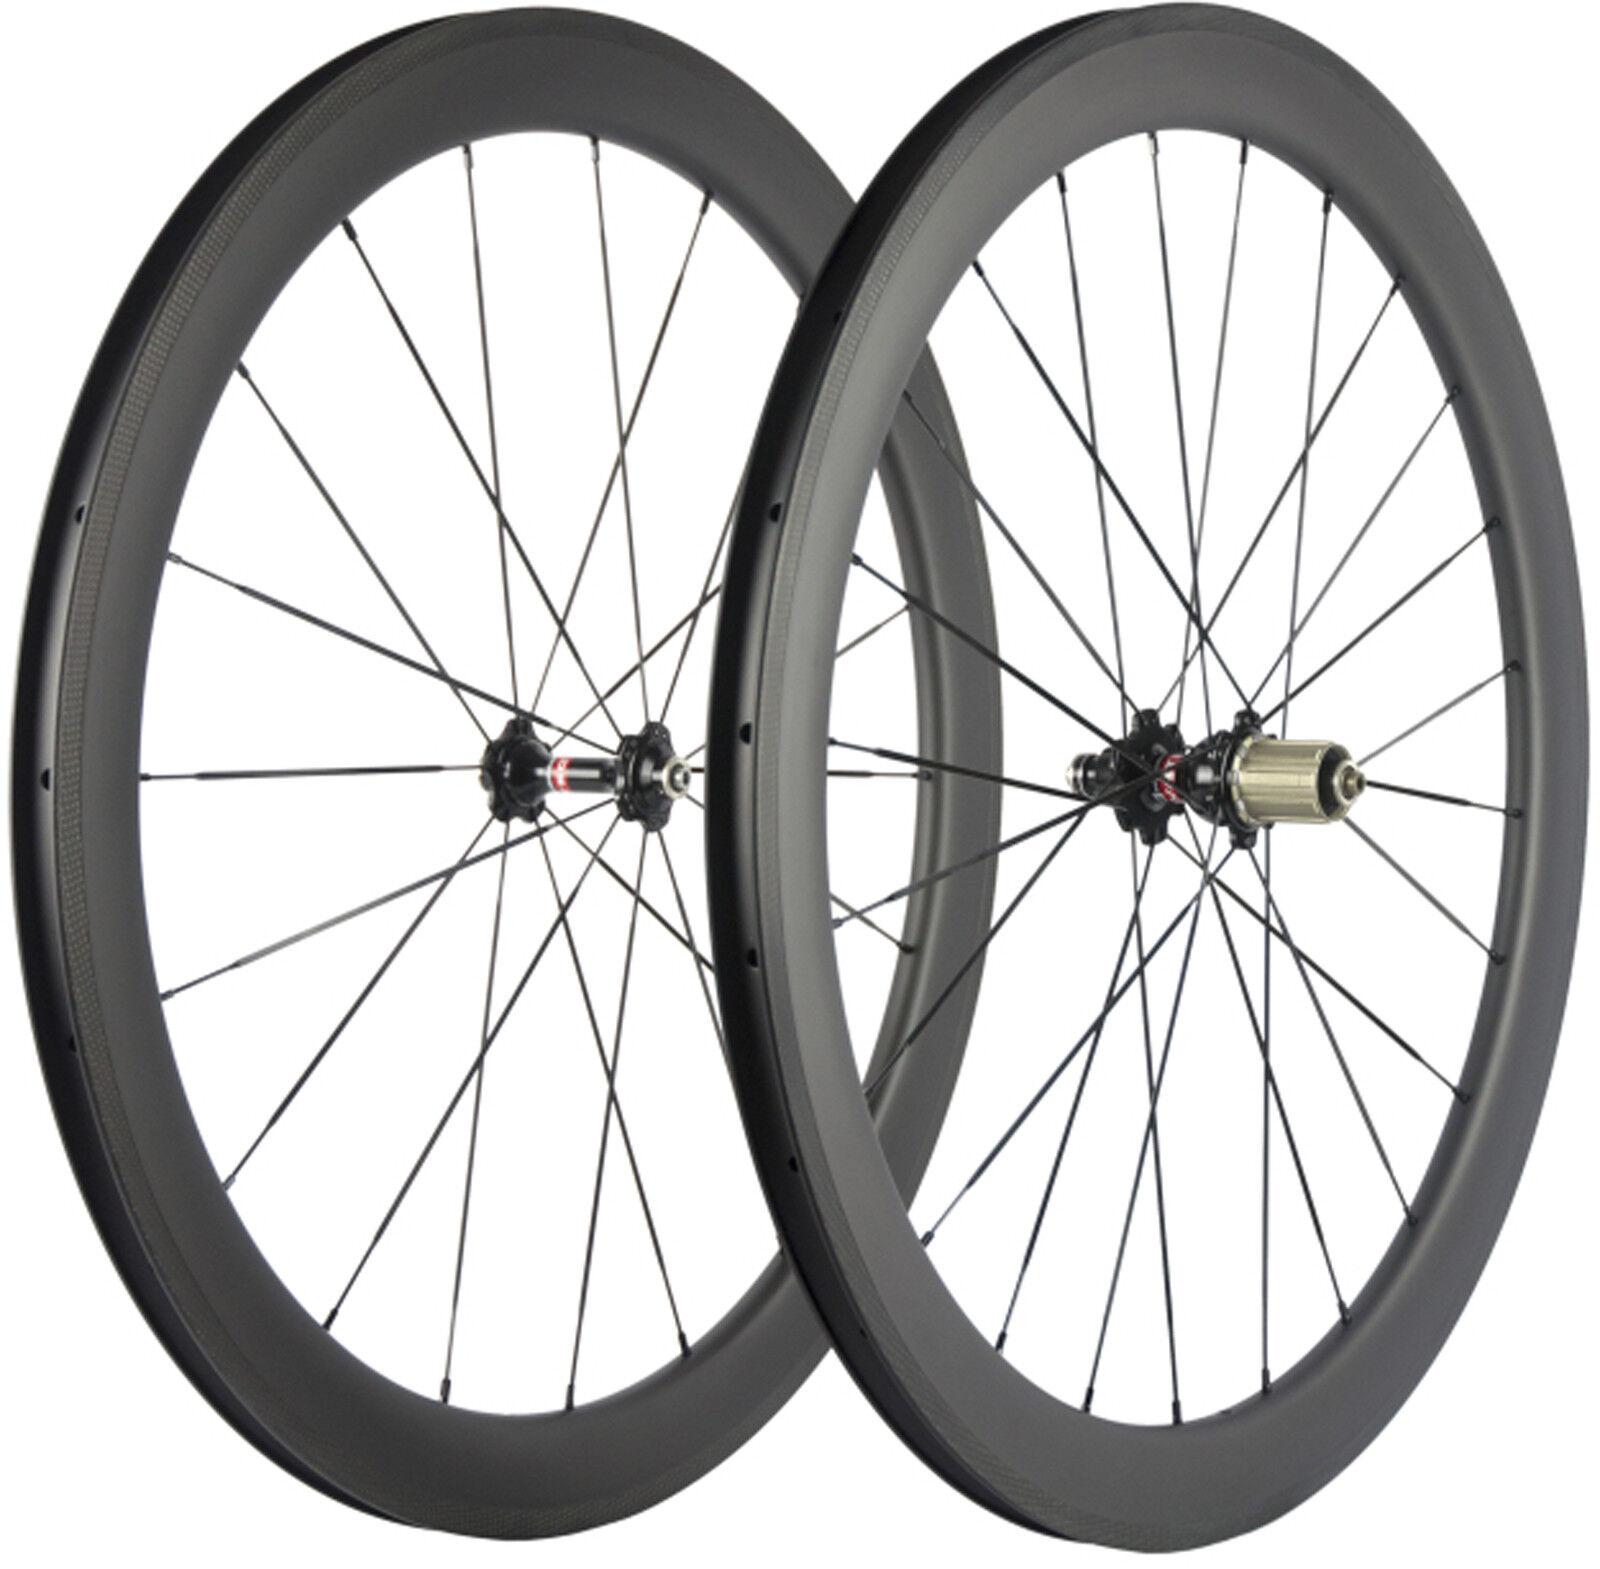 50mm U Shape Clincher Wheelset 700C Road Bike Wheels Novatec 271 Hub UD Shimano